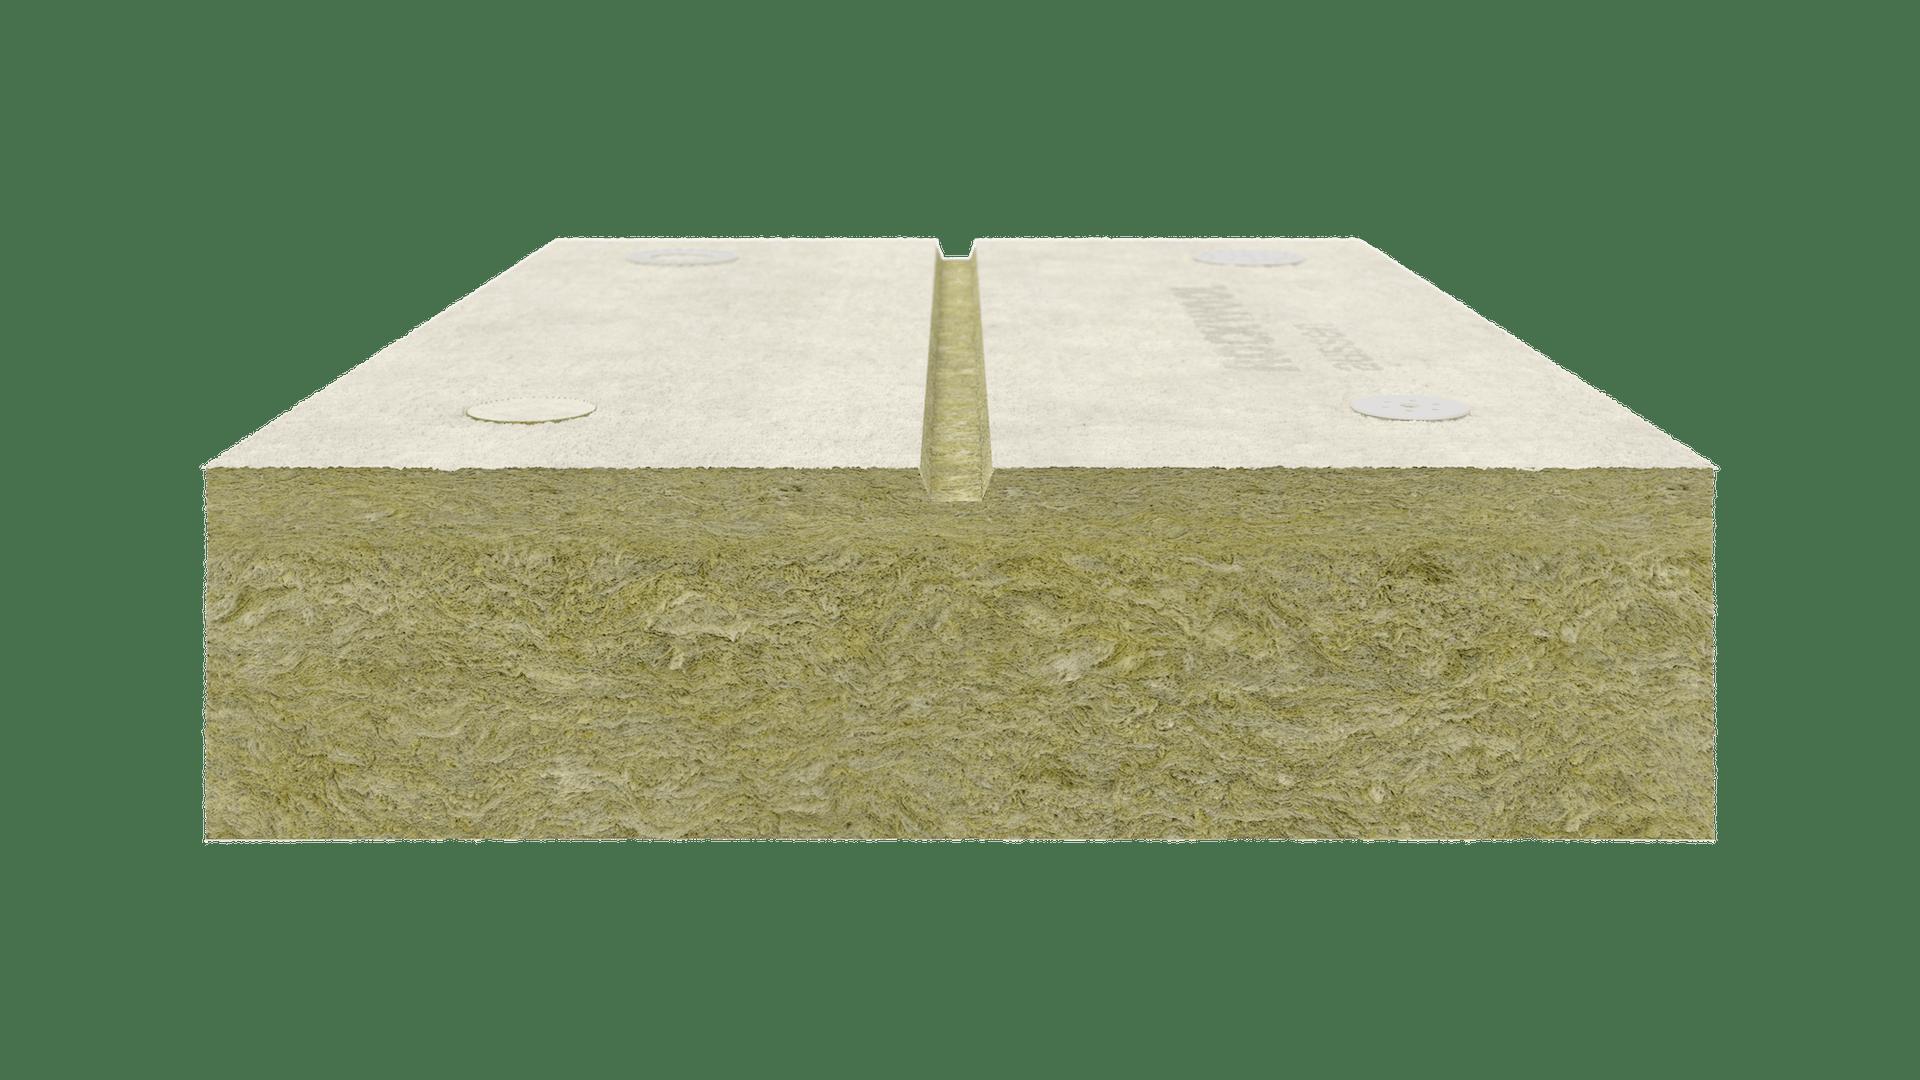 coverrock deko, product, rendering, facade, etics, wdvs, wärmedämmverbundsystem, bossendämmplatte, bossennut, germany, platte liegend, nut trapez schmal, png